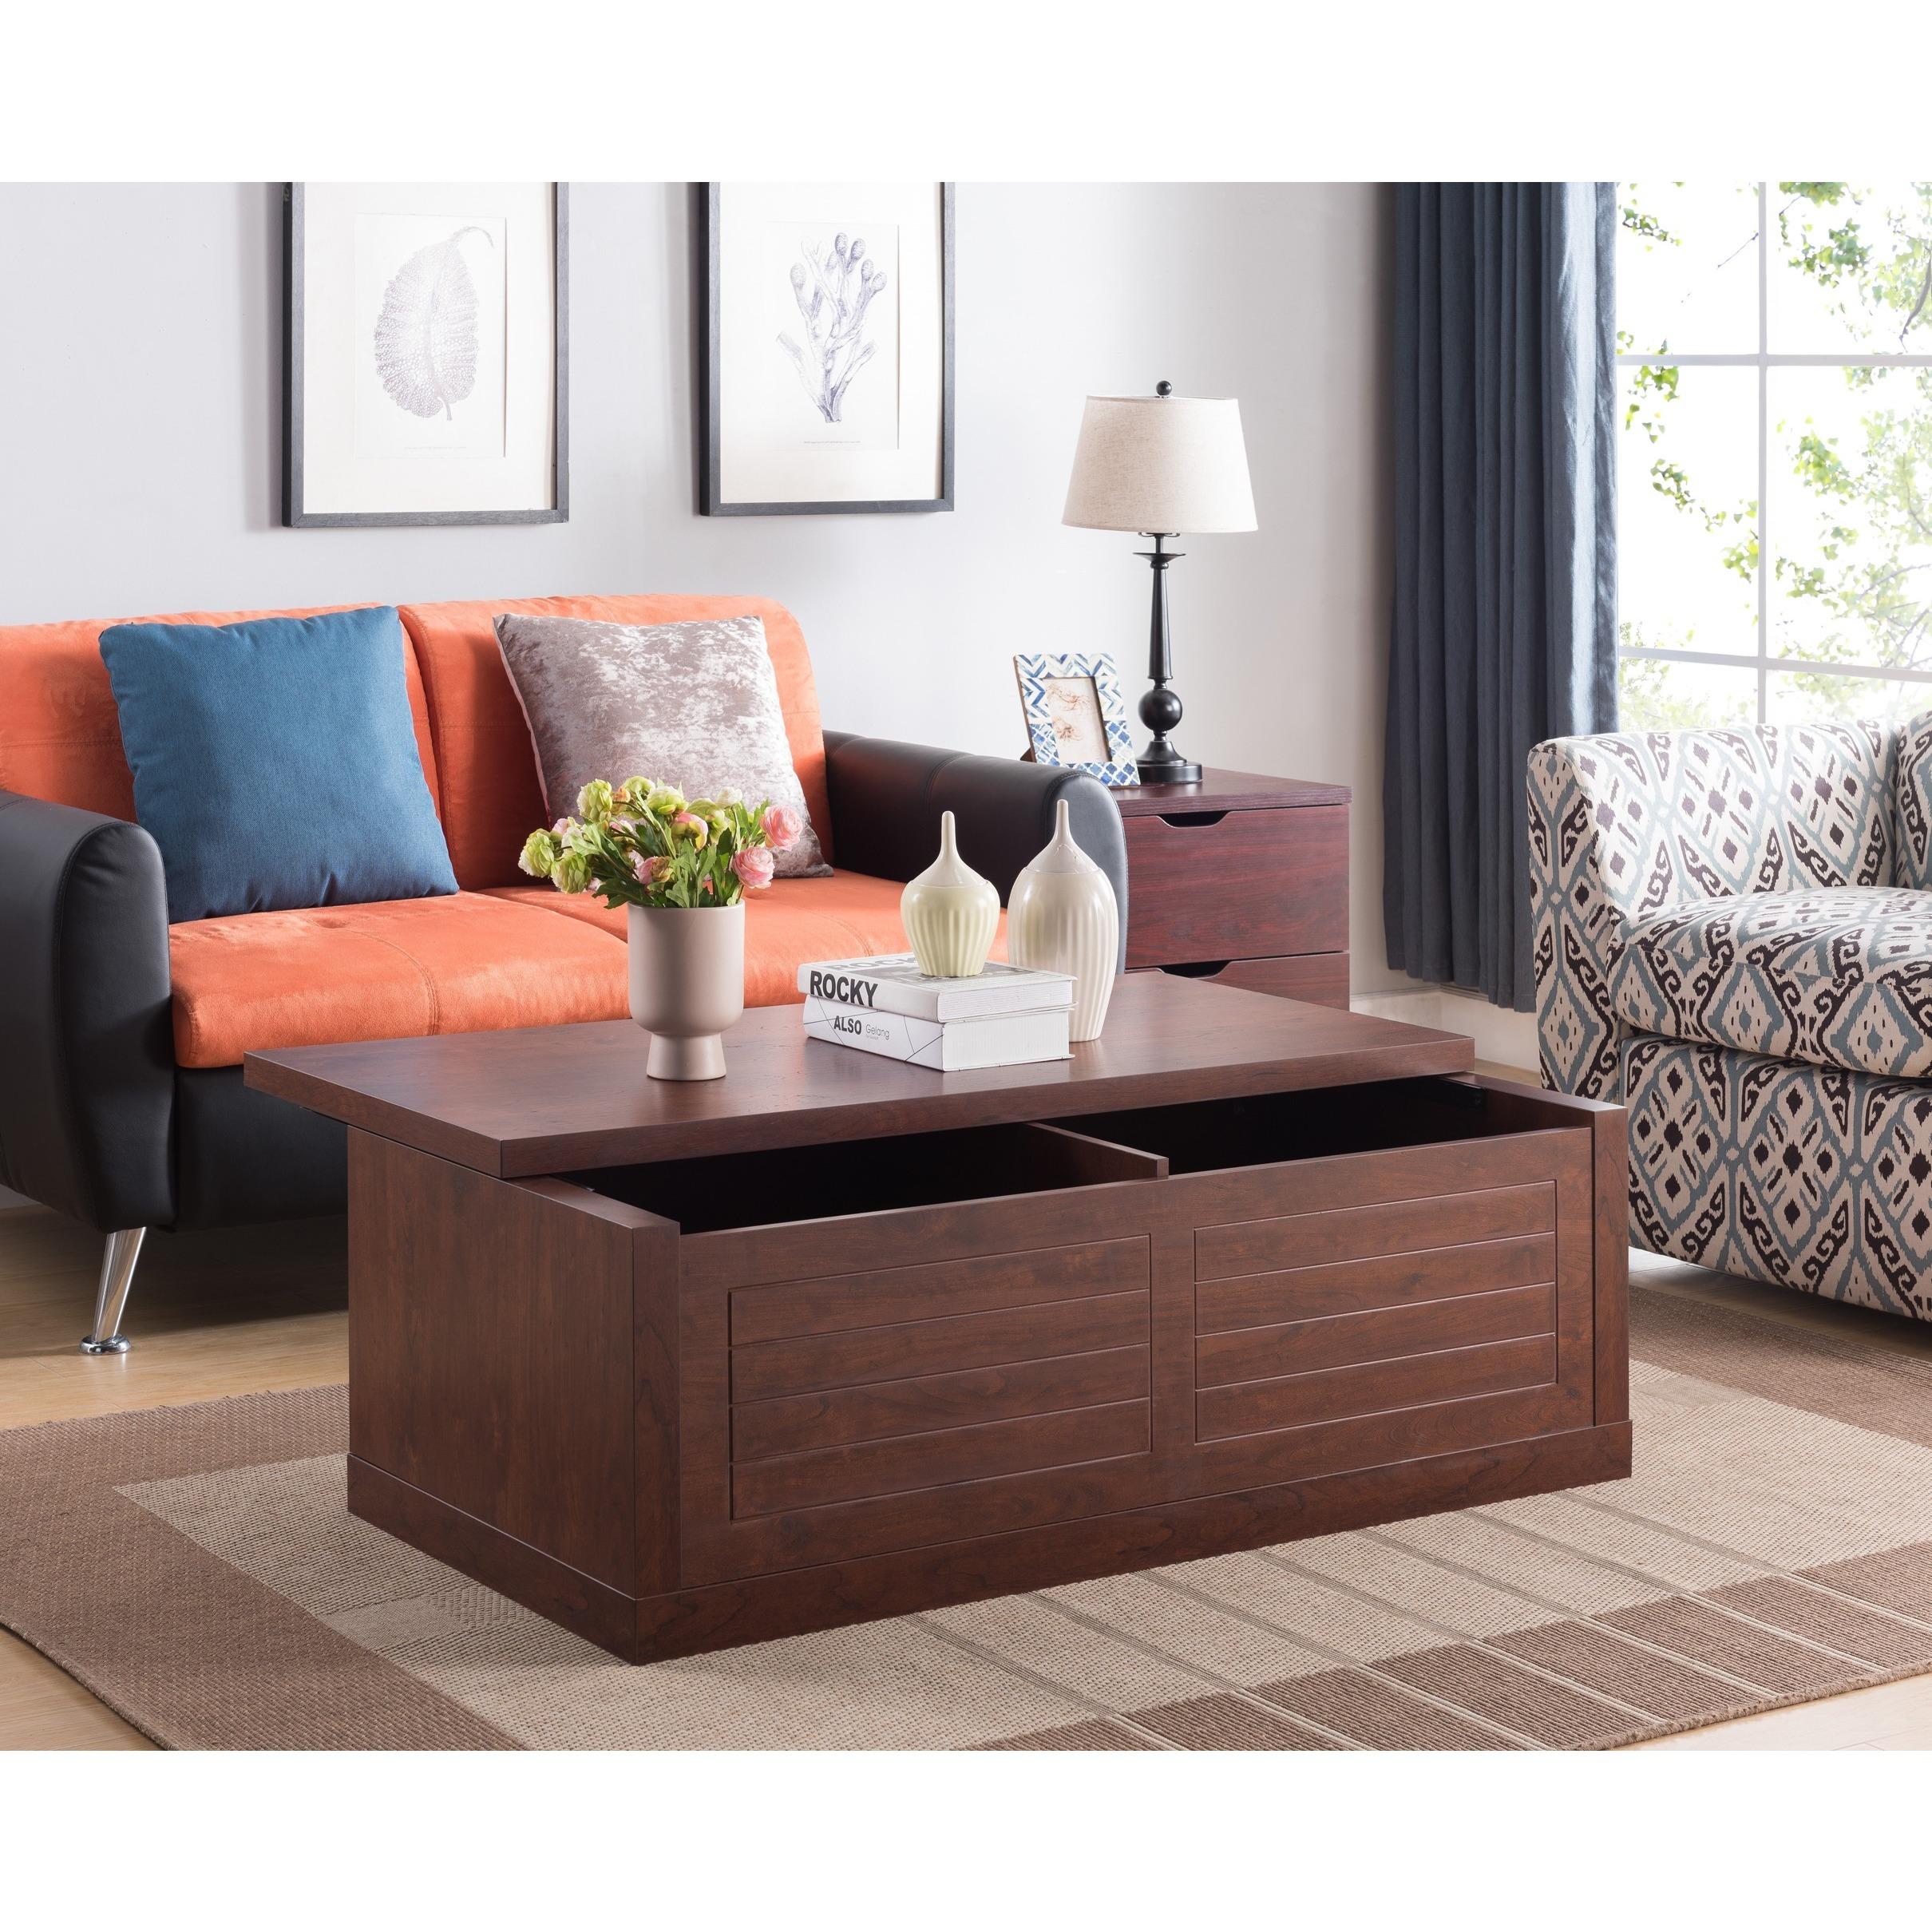 Furniture of America Retora Two tone Distressed Grey Black Wood